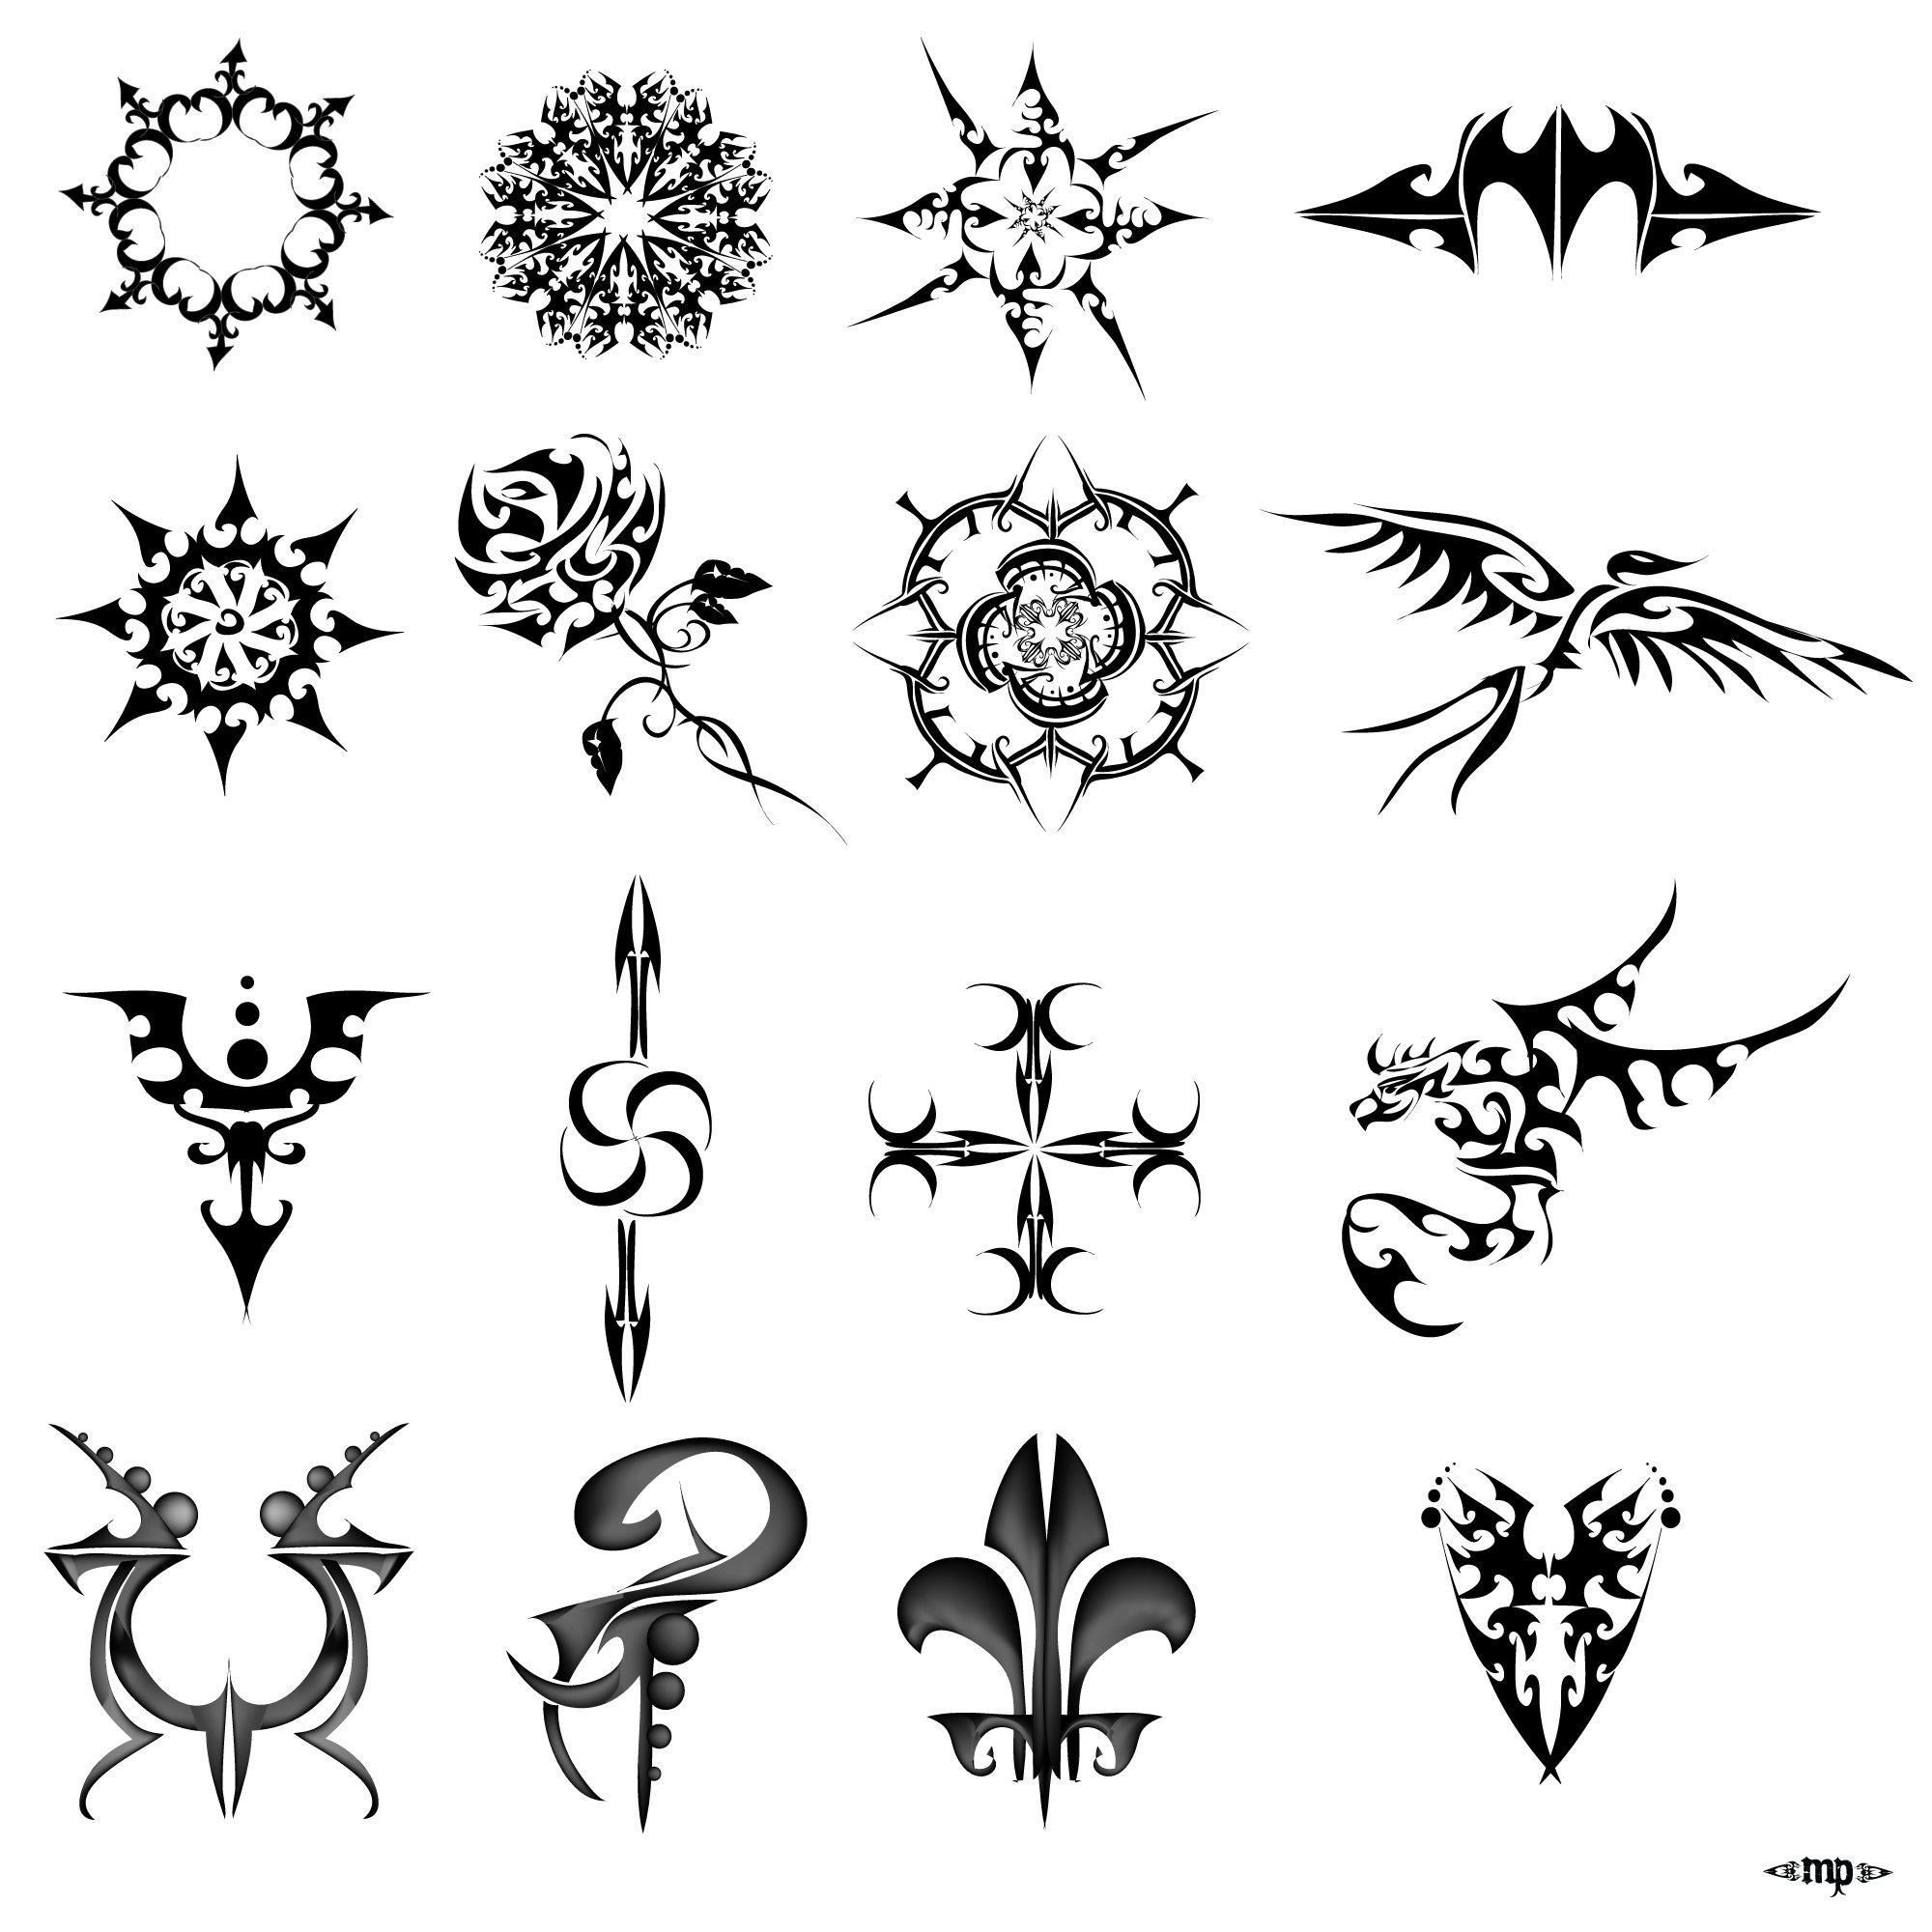 10 Attractive Simple Tattoo Ideas For Guys tattoo designs google kereses tat pinterest symbols tattoo